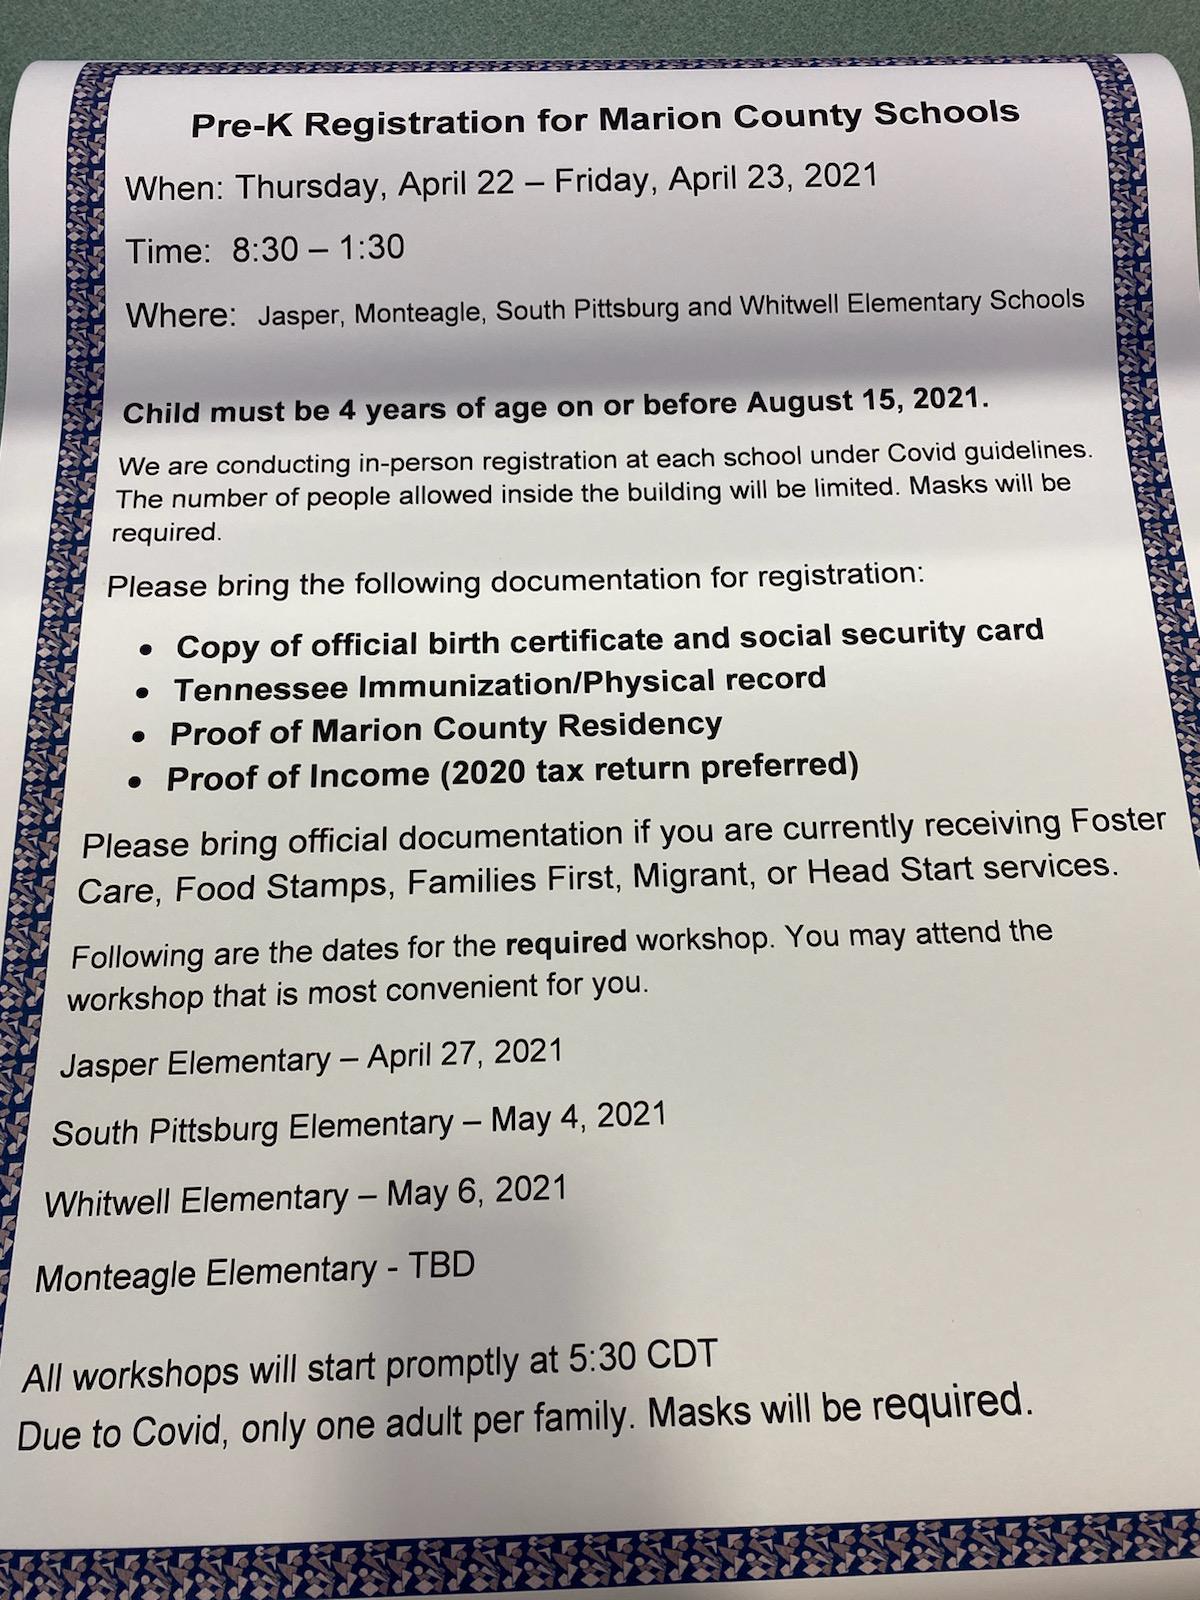 prek registration